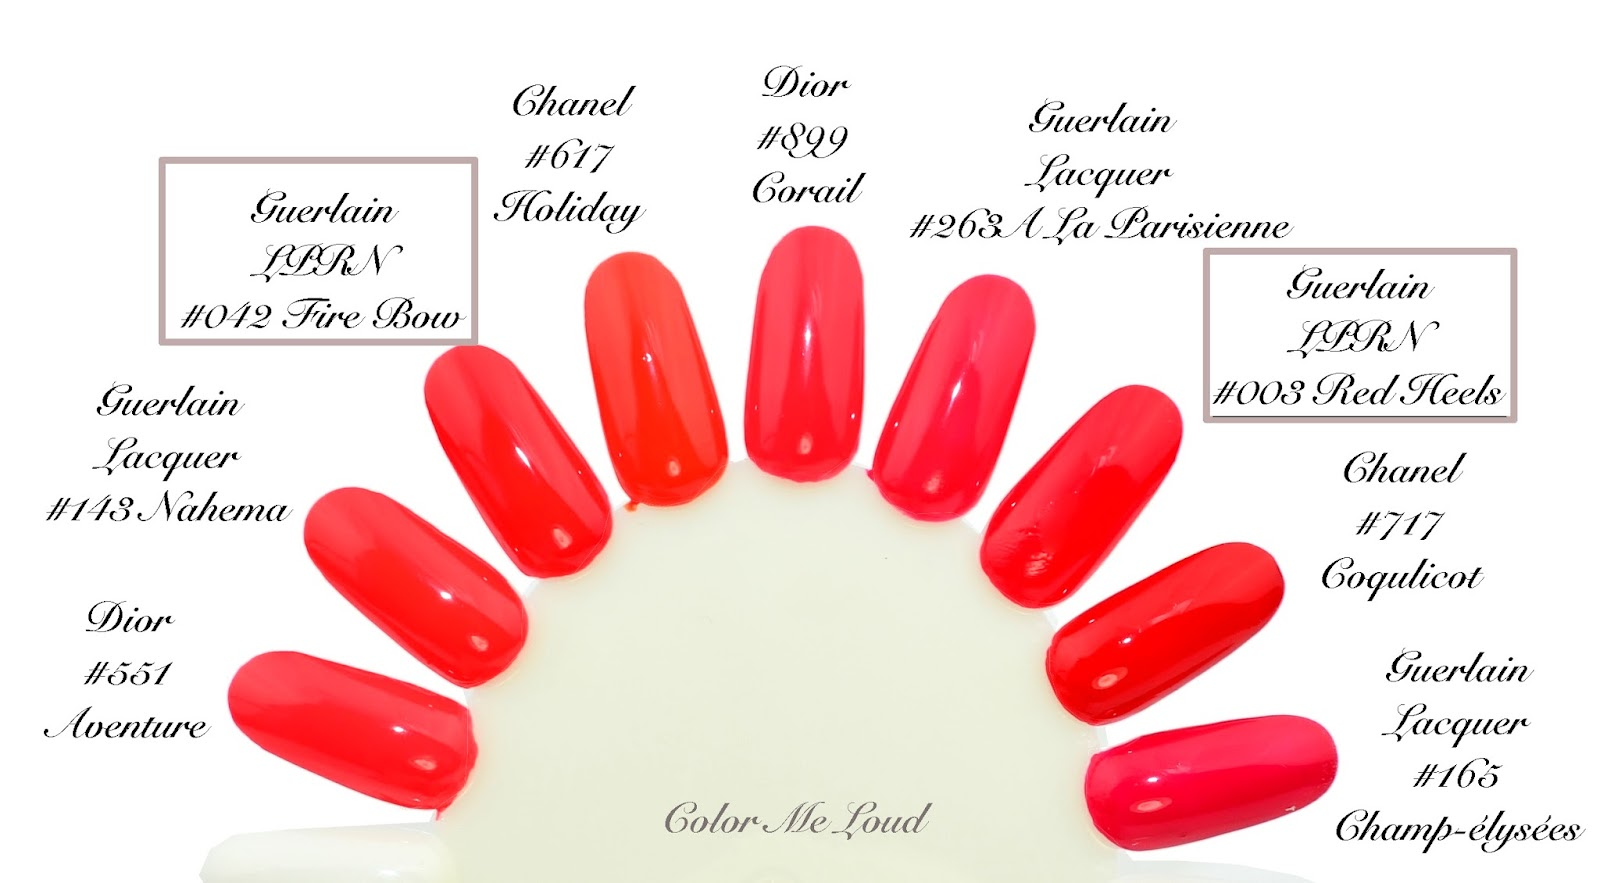 Swatch Comparison Guerlain La Pee Robe Noire 042 Fire Bow 003 Red Heels